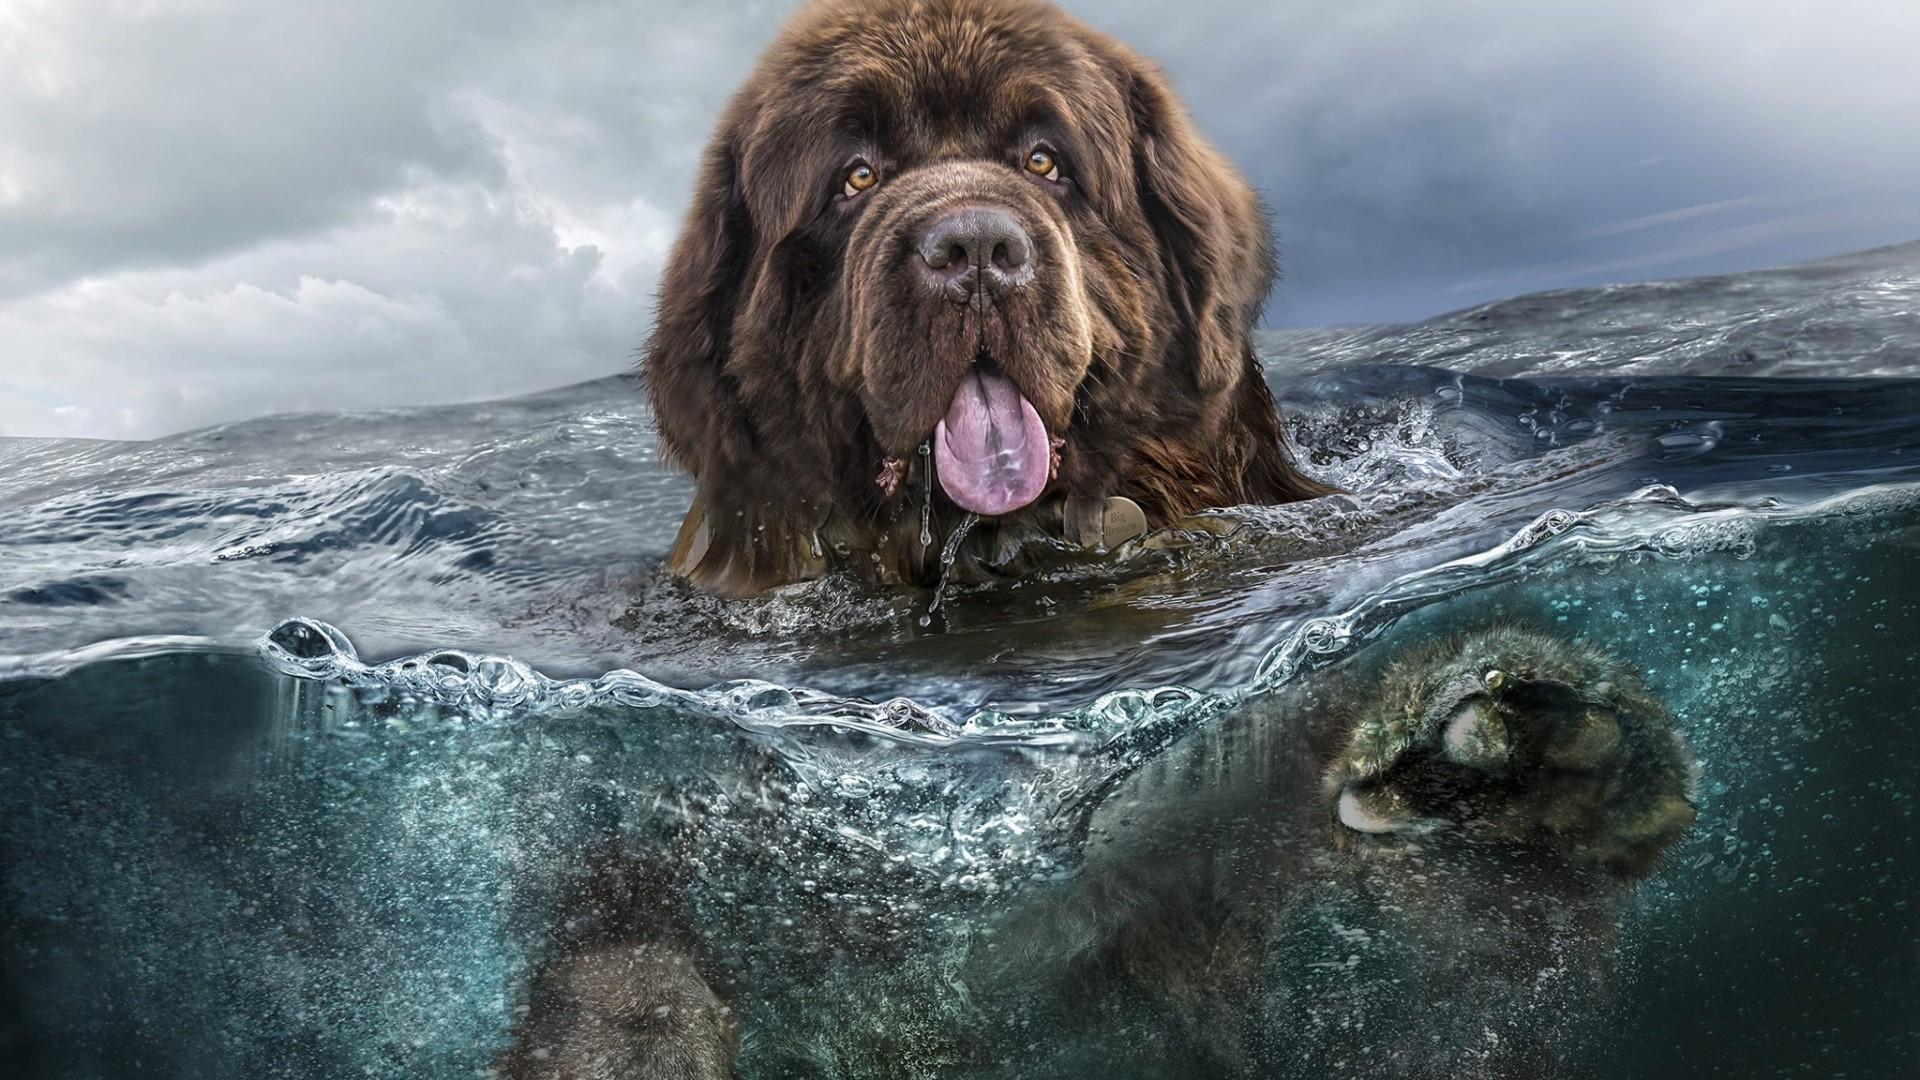 Wallpaper Dog Water 4k Animals 14942